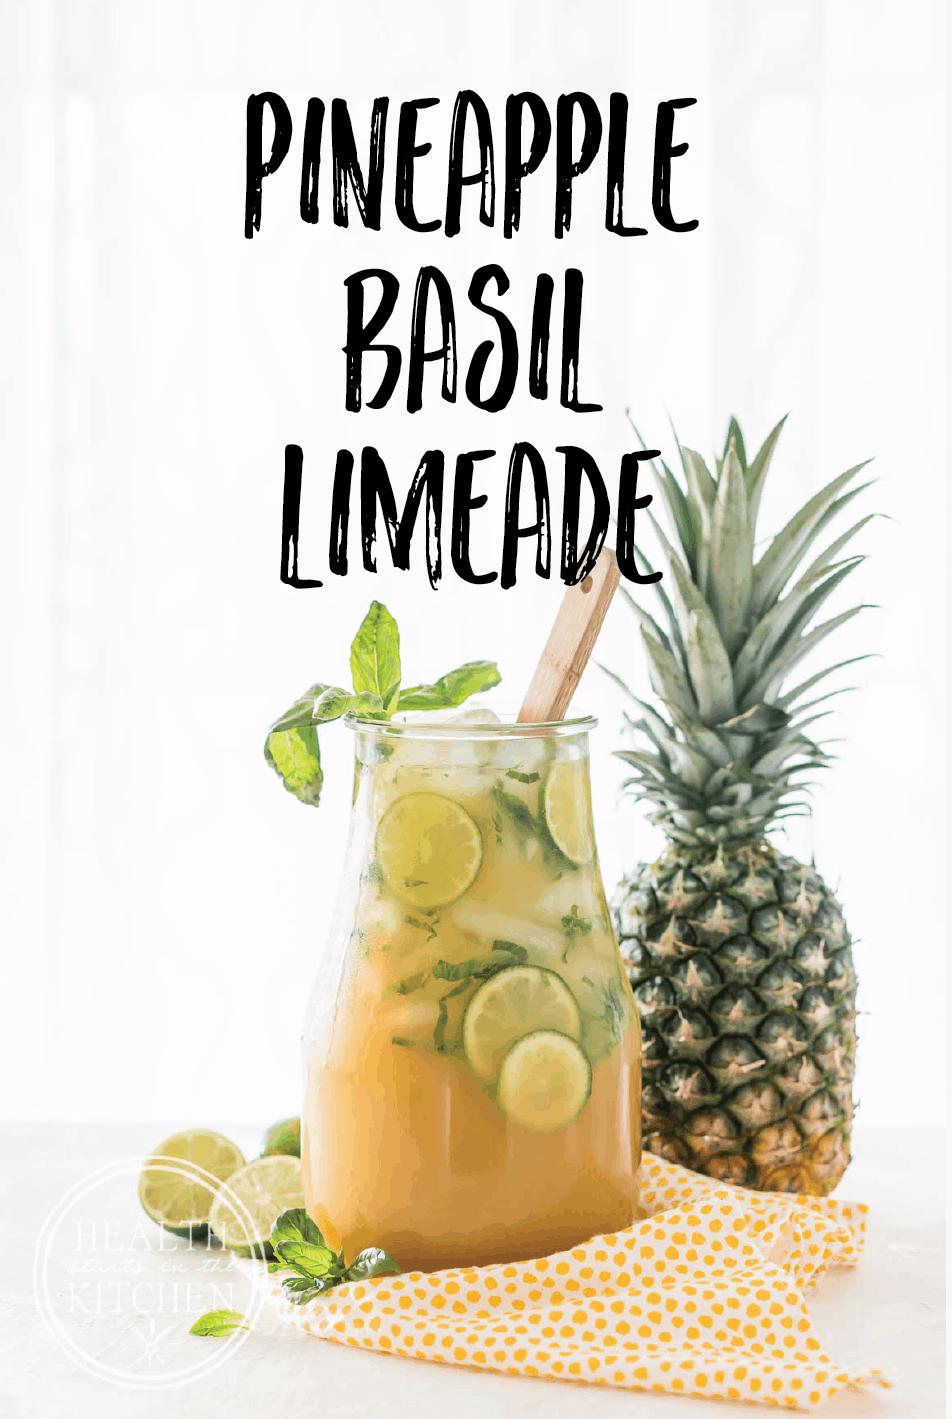 Pineapple Basil Limeade